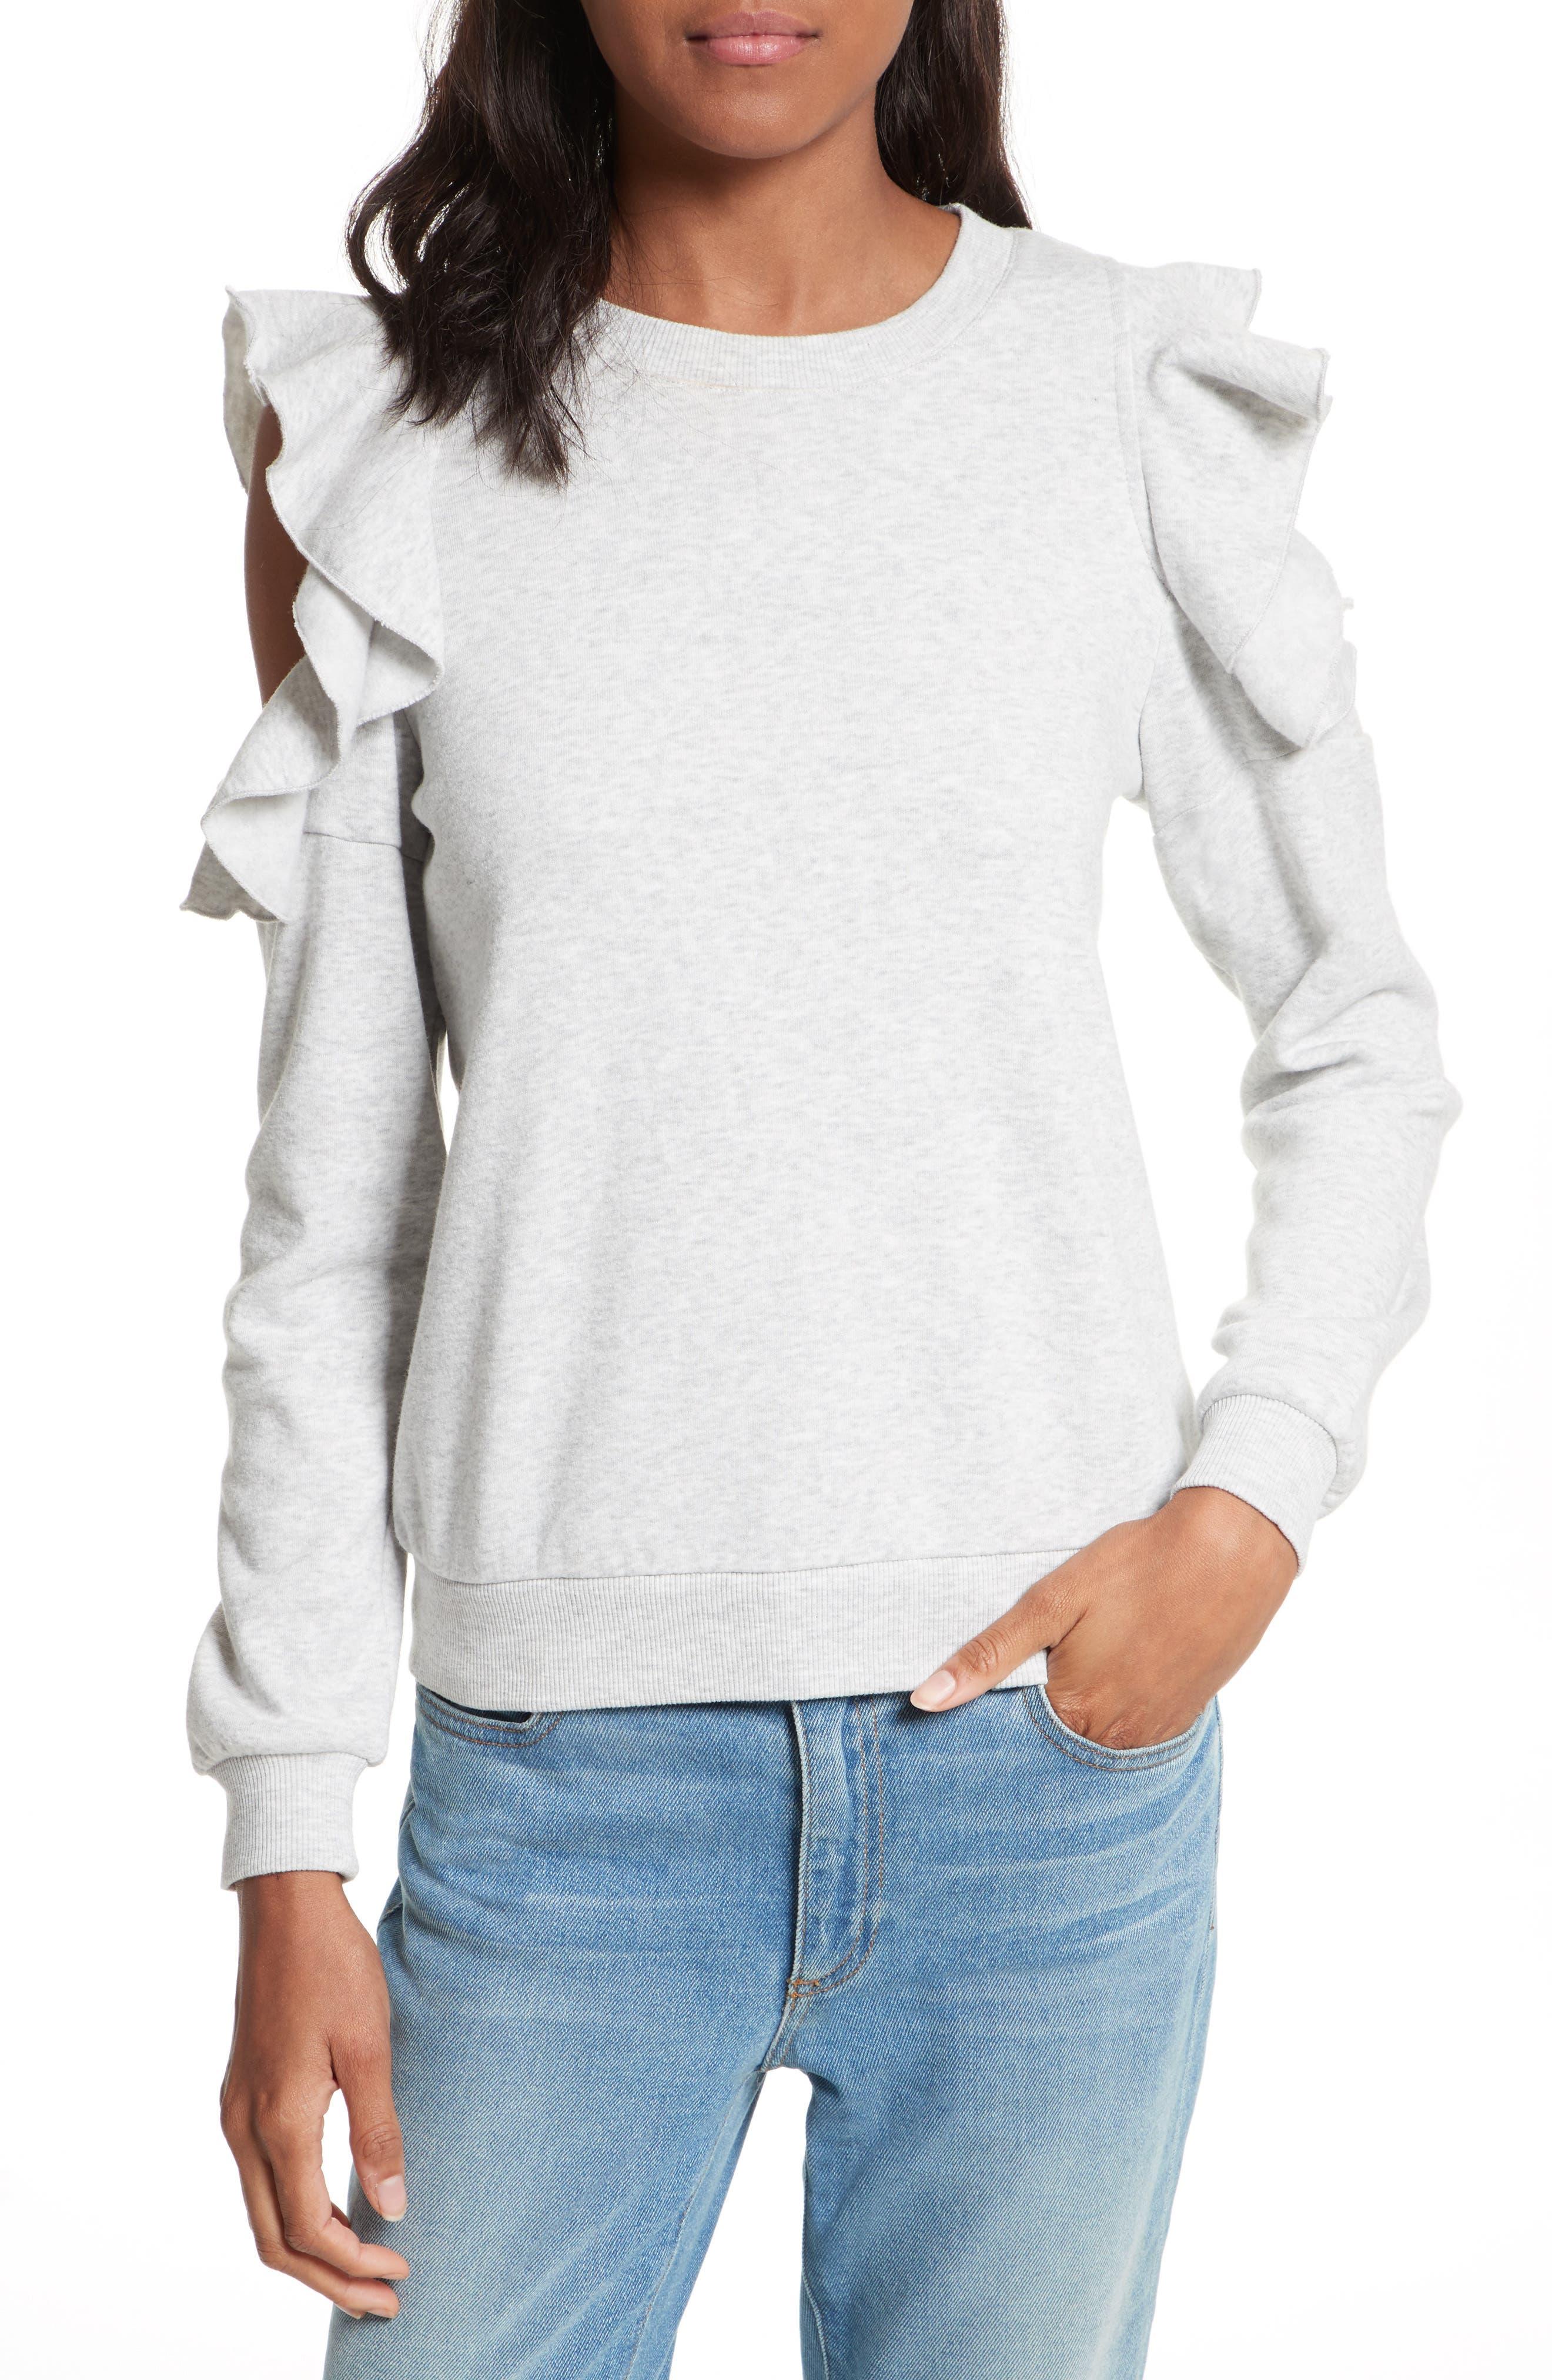 Gracie Cold Shoulder Sweatshirt,                         Main,                         color, Light Heather Grey